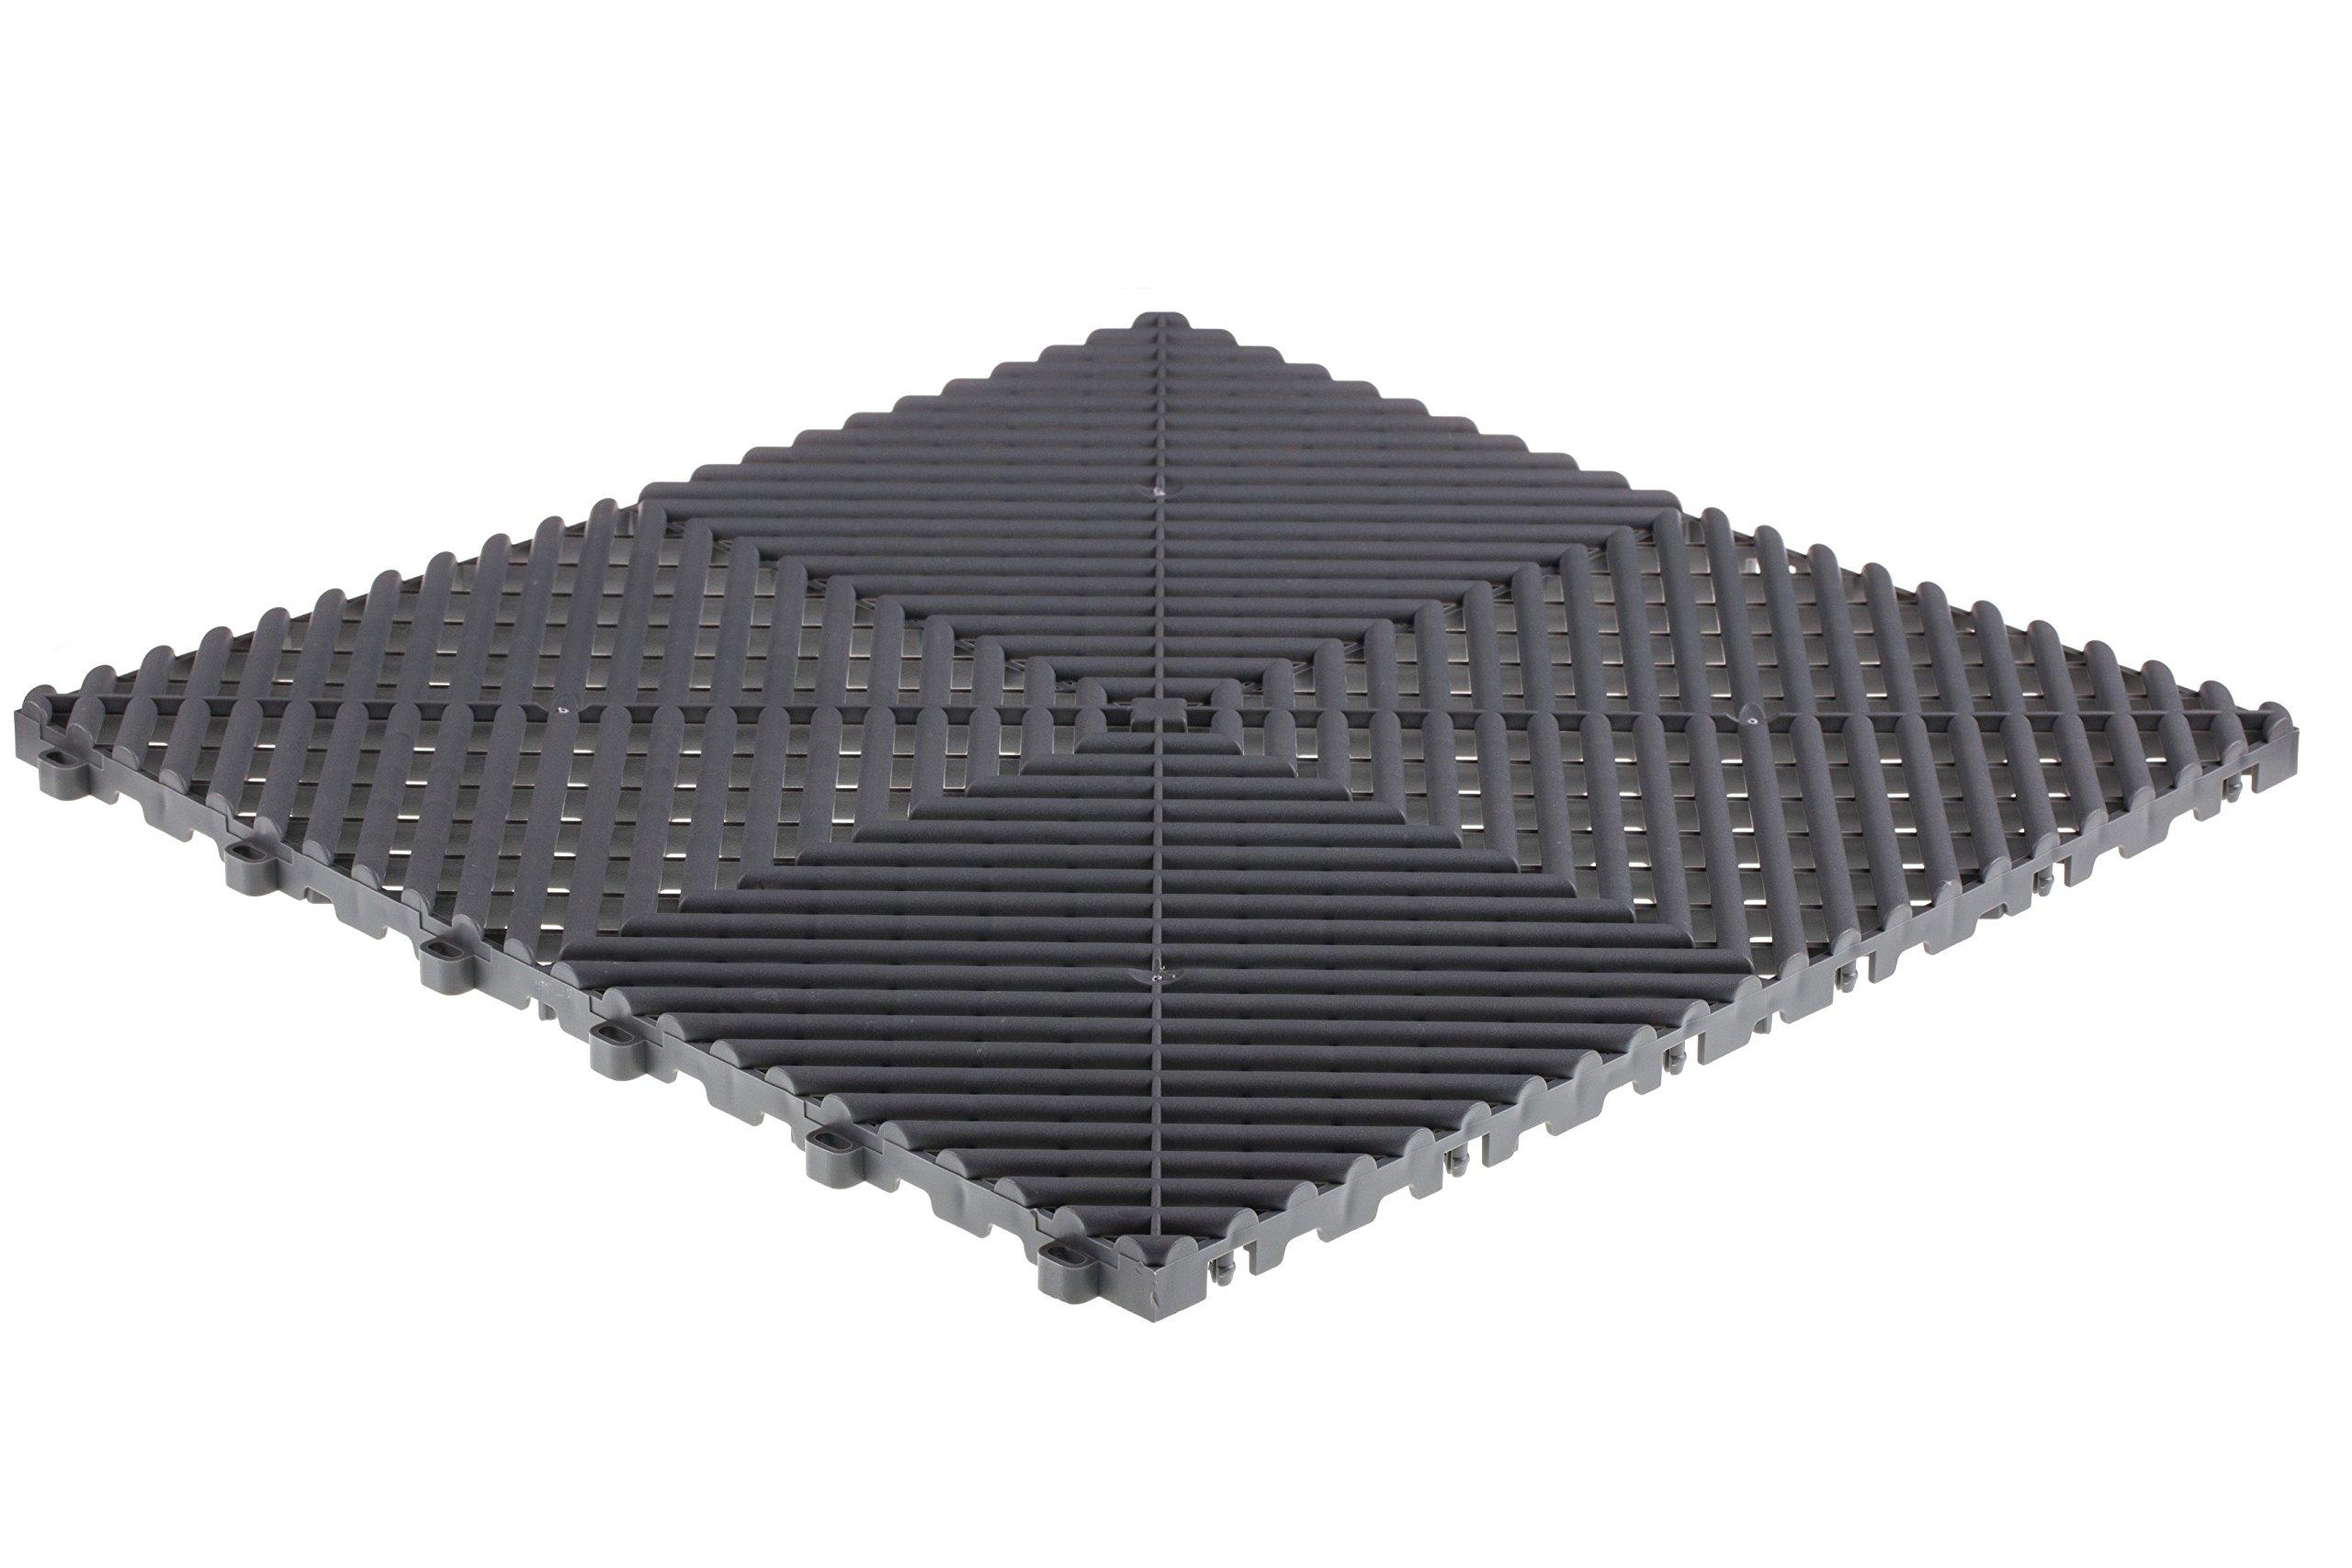 Swisstrax (A504.000.203-25) Ribtrax Modular Flooring Tile, Slate Grey - (Pack of 25)